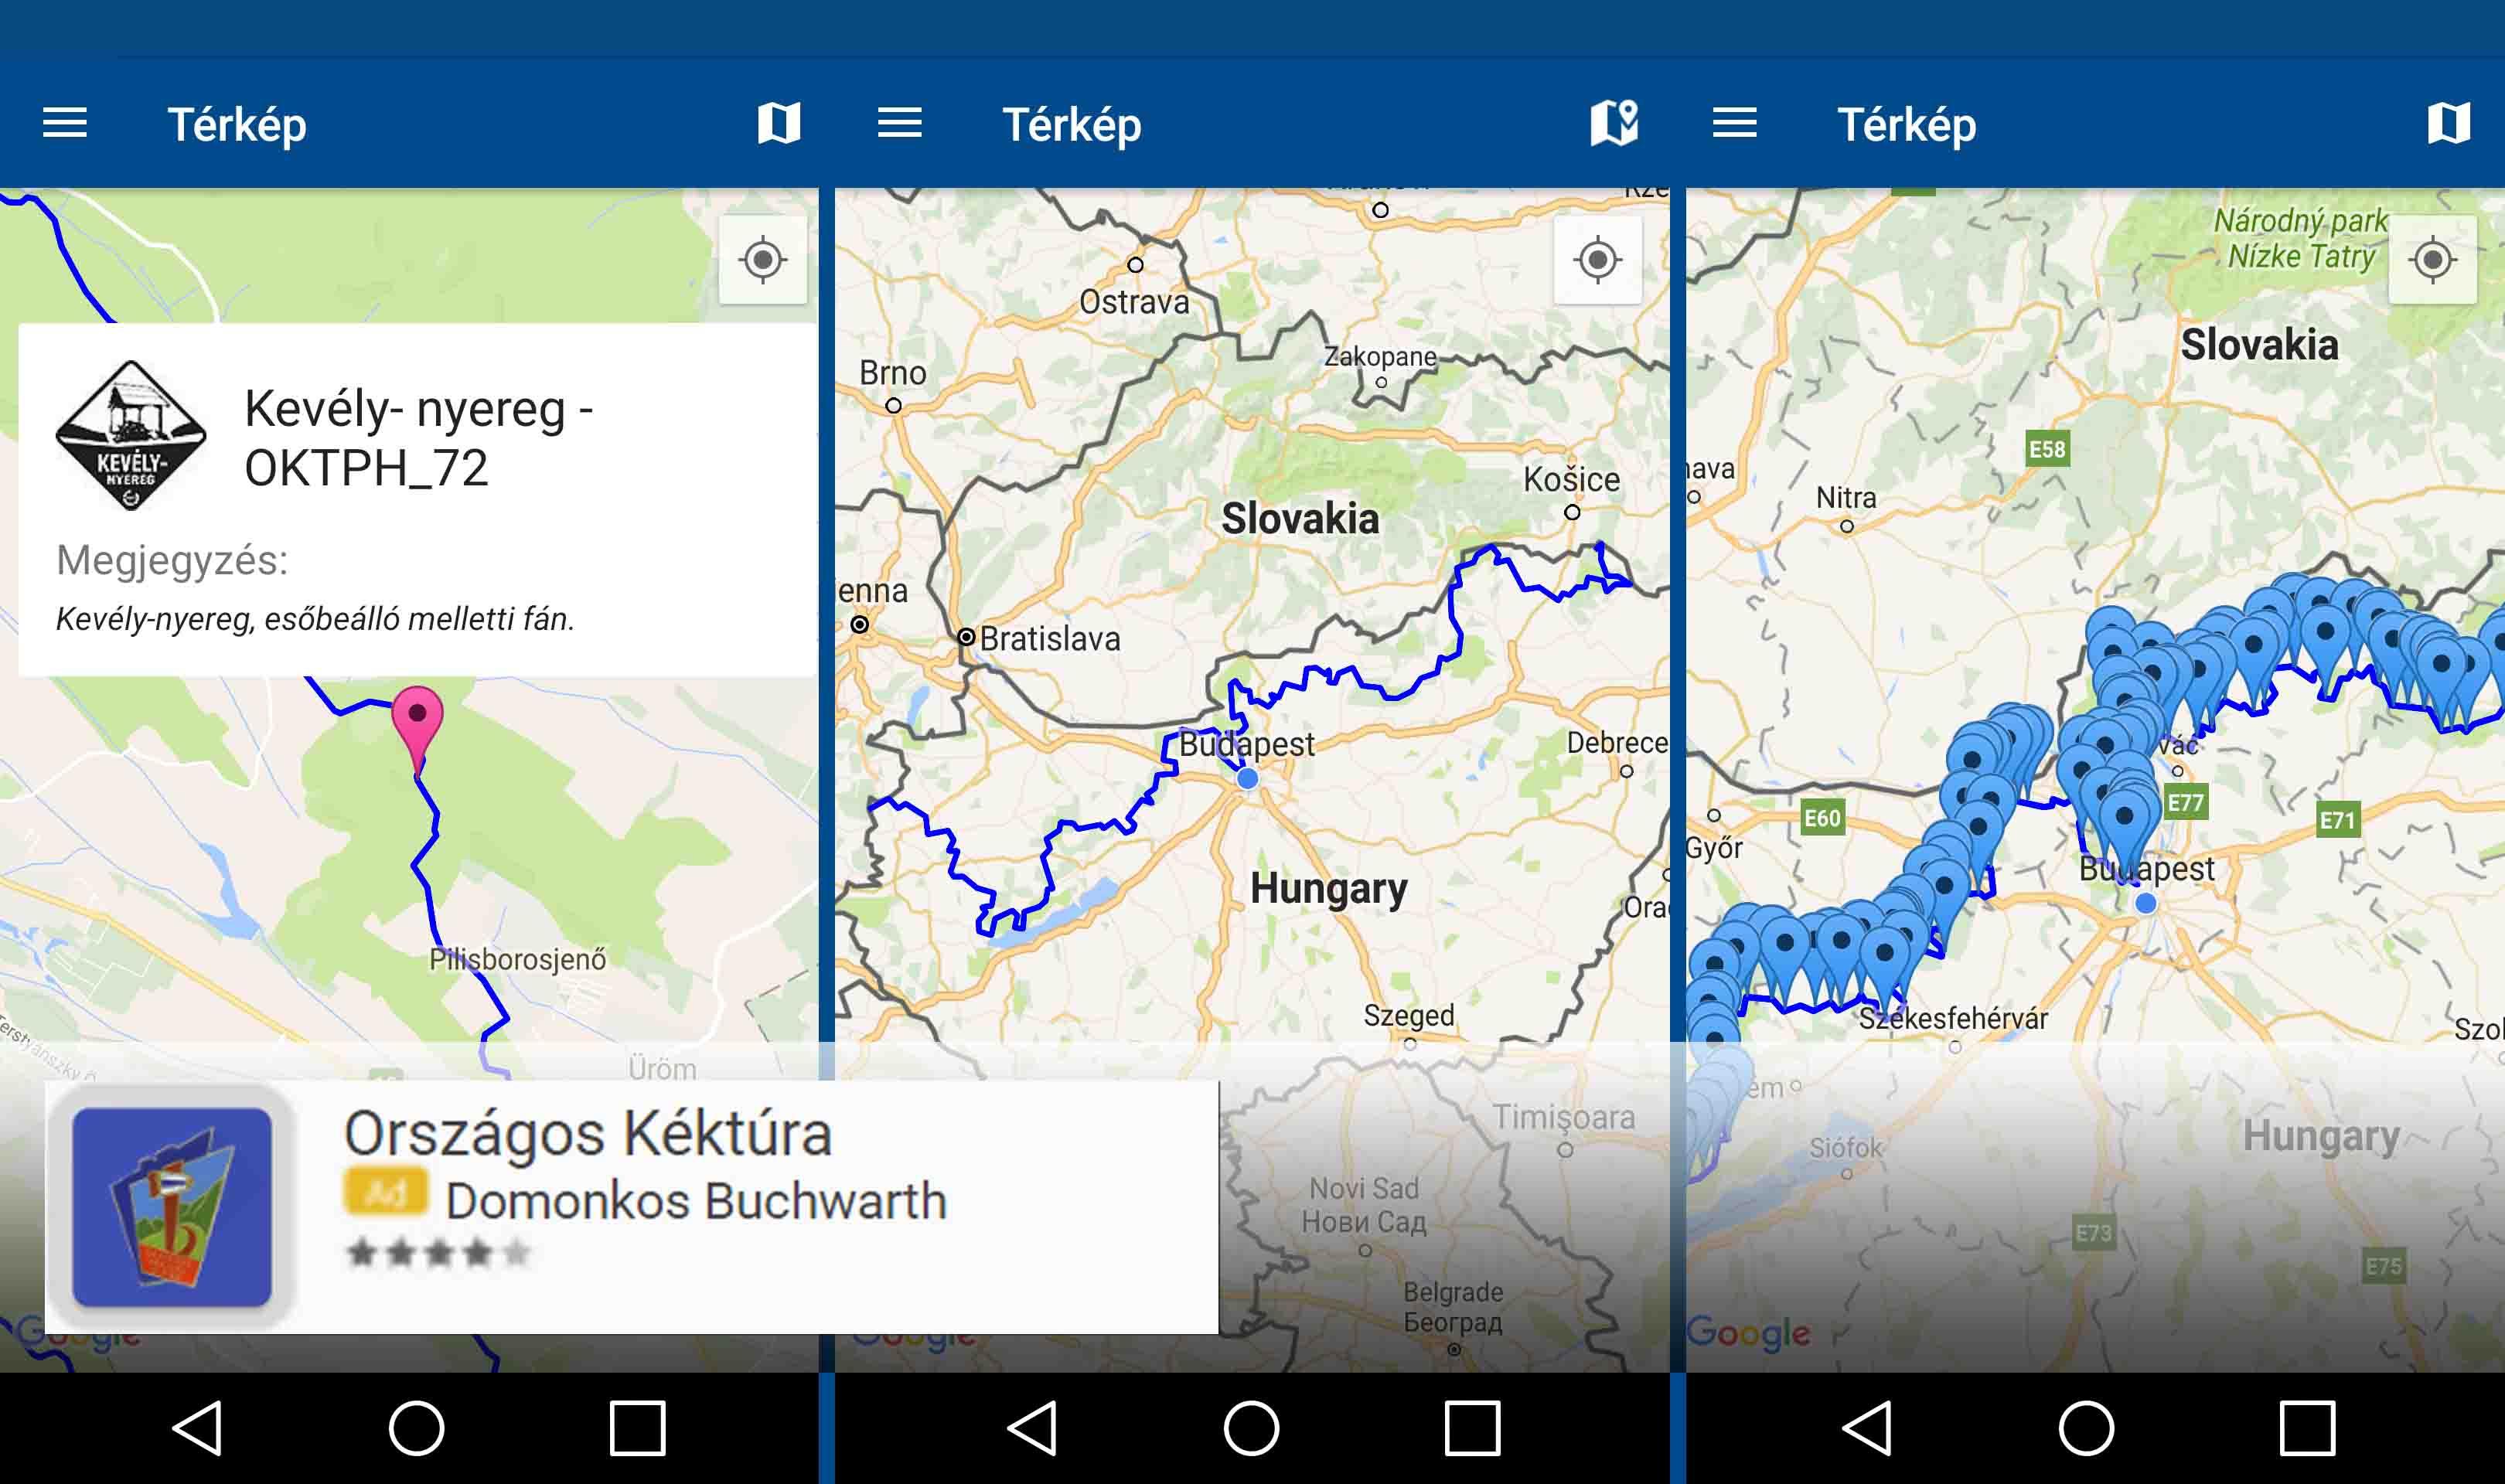 Kektura App V1 1 Terkep Funkcio Herfli Hu